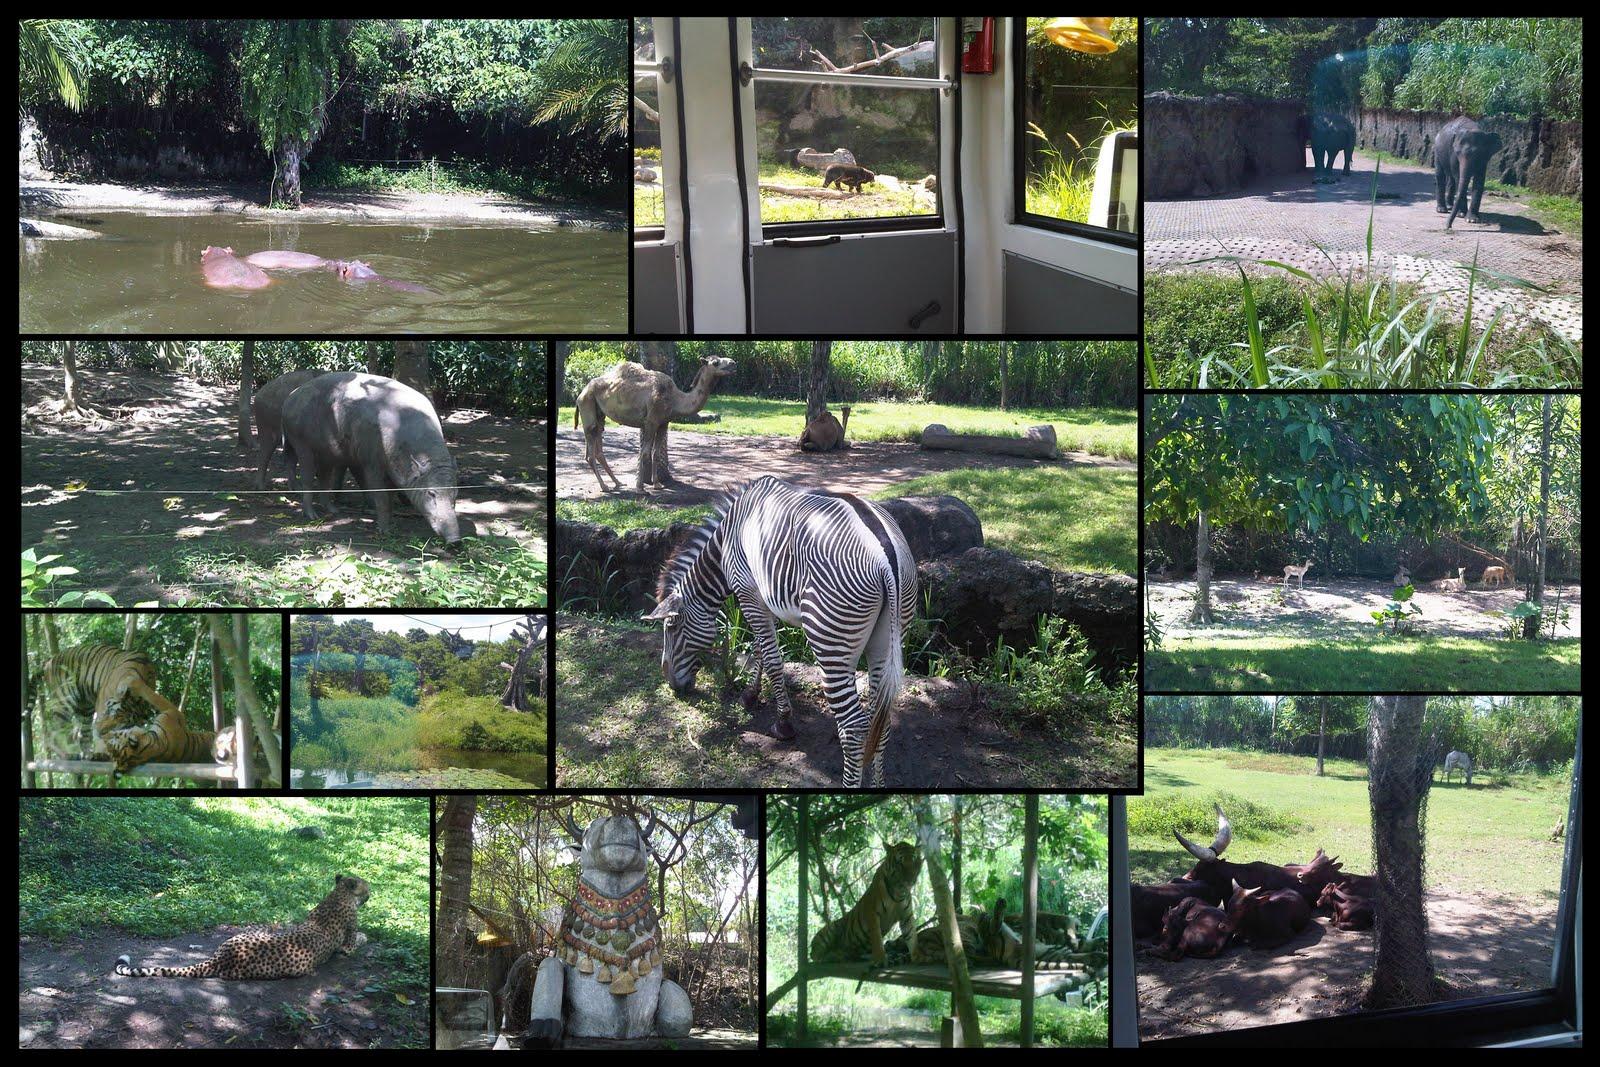 Objek Wisata Keluarga Taman Safari Indonesia | Pariwisata